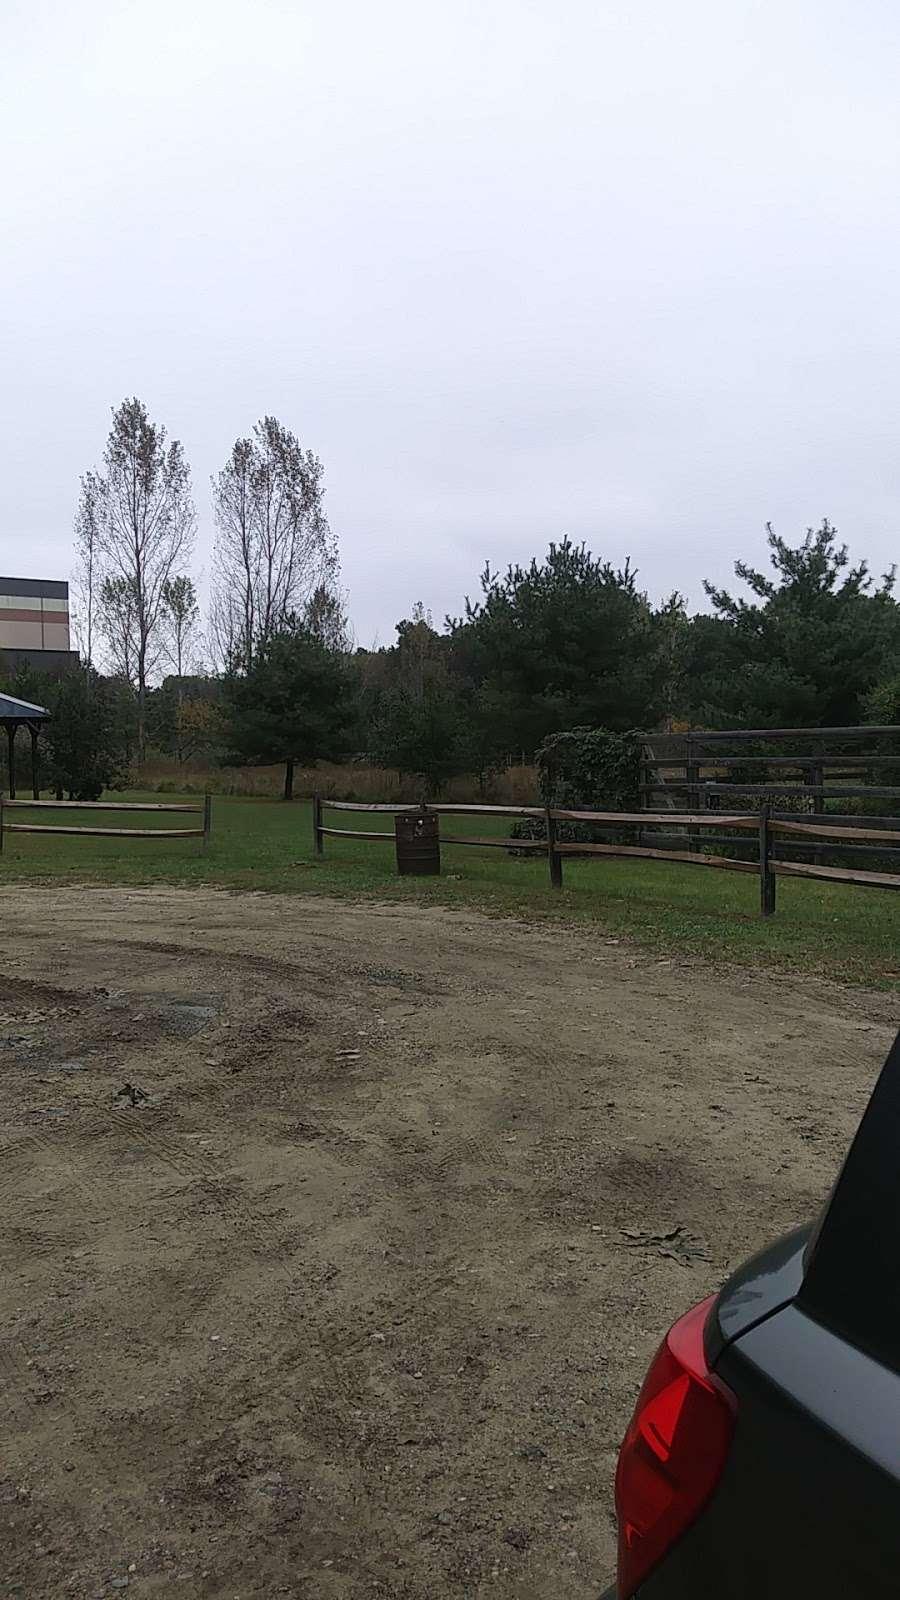 Wheelabrator Wildlife Refuge and Butterfly Garden - park  | Photo 5 of 8 | Address: West Deptford, NJ 08093, USA | Phone: (856) 742-1484